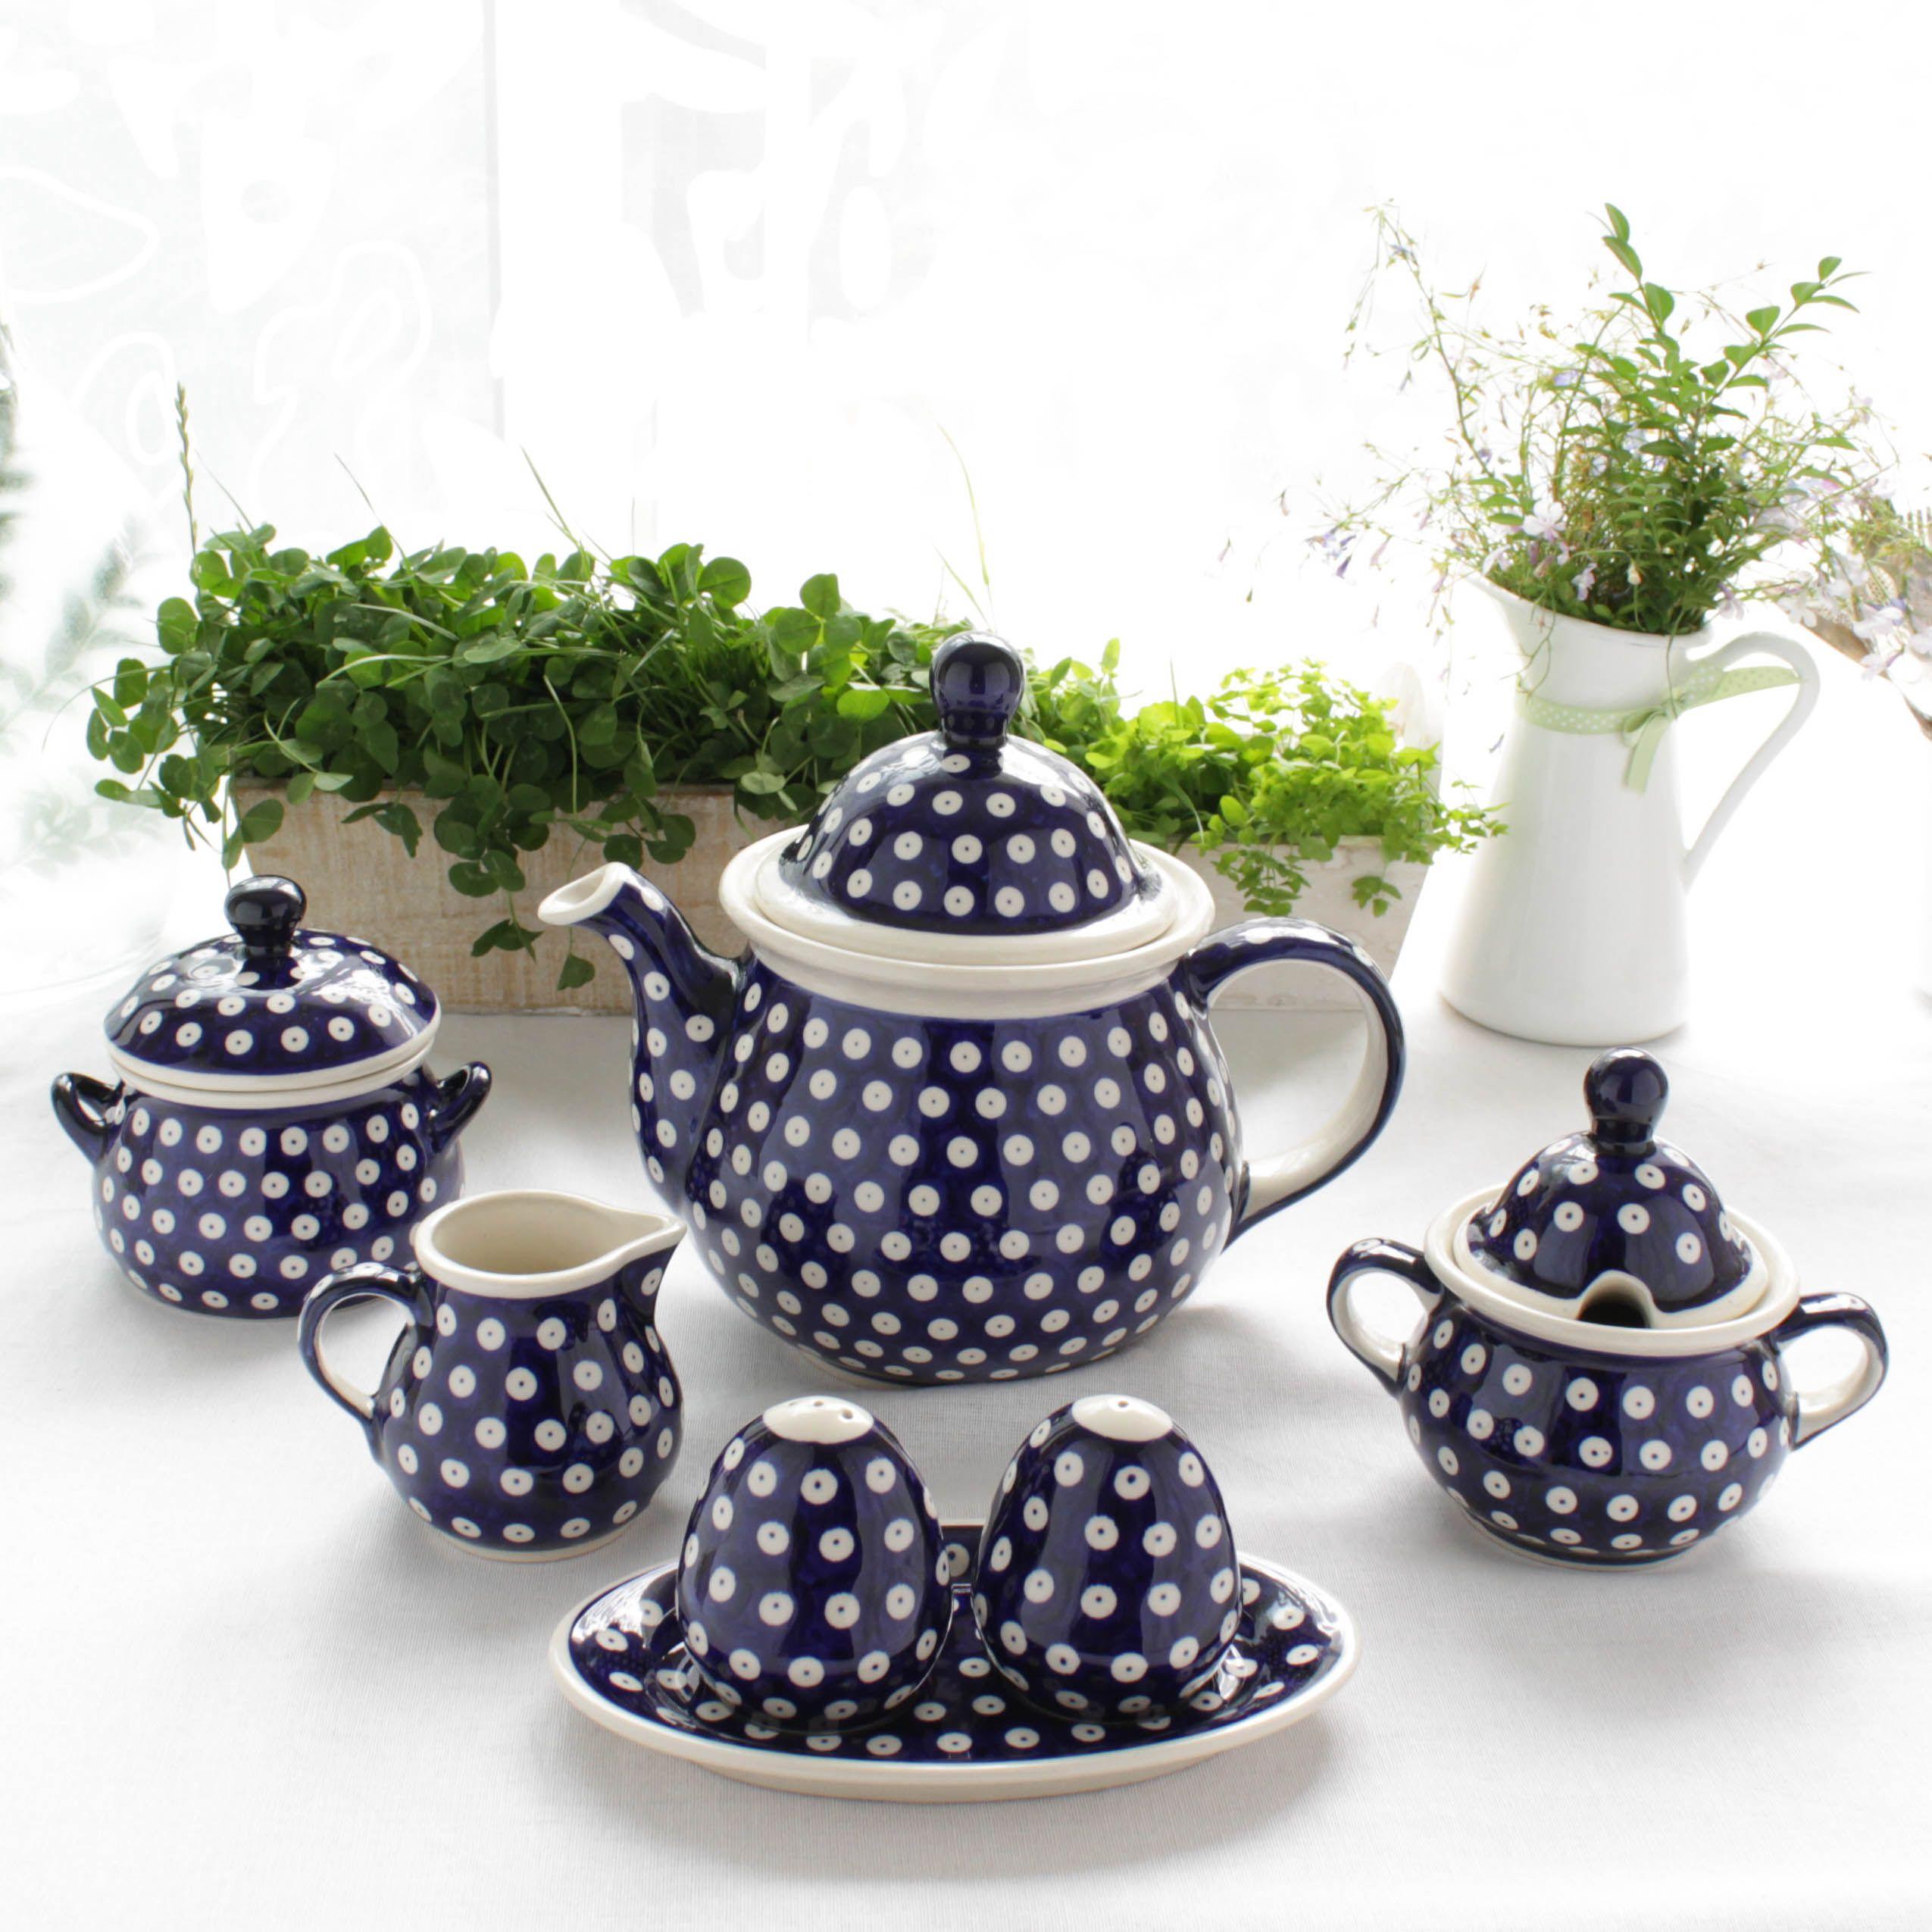 Polish pottery boleslawiec tea set how cute chuladas pinterest teteras vajillas y - Vajilla rustica ...